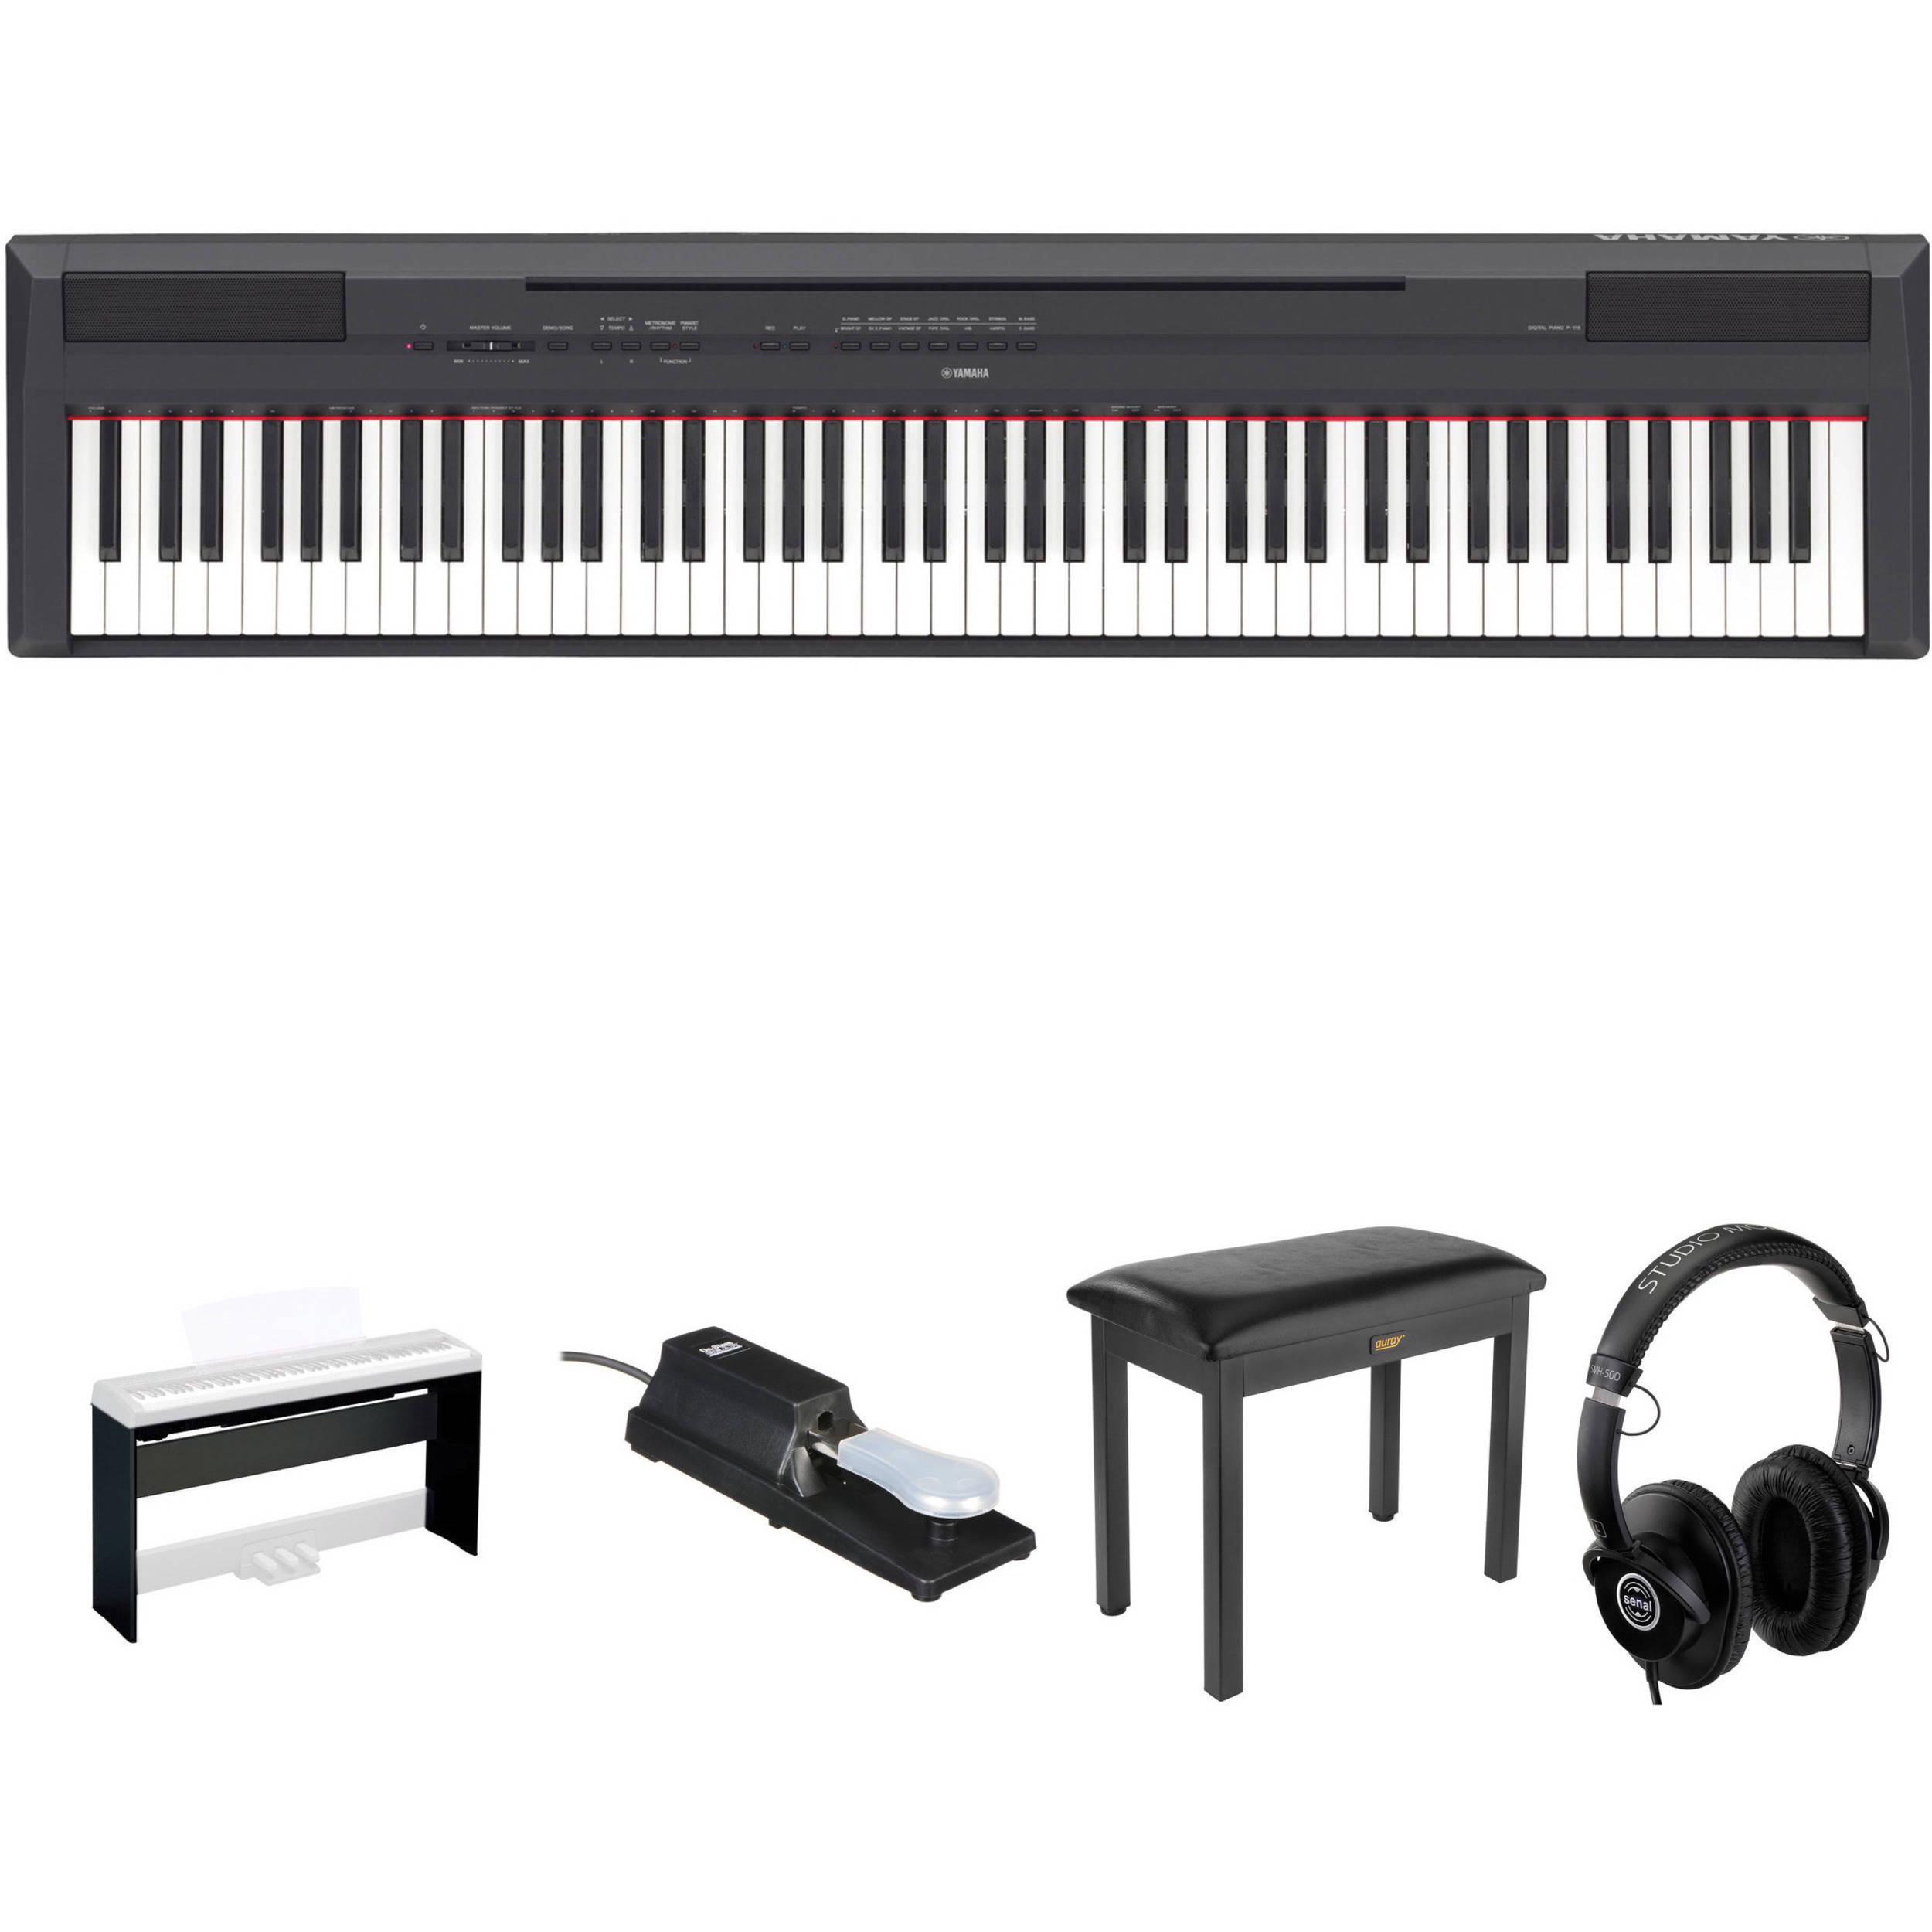 yamaha 88 key digital piano. yamaha p-115 88-key digital piano kit with stand, pedal, bench 88 key